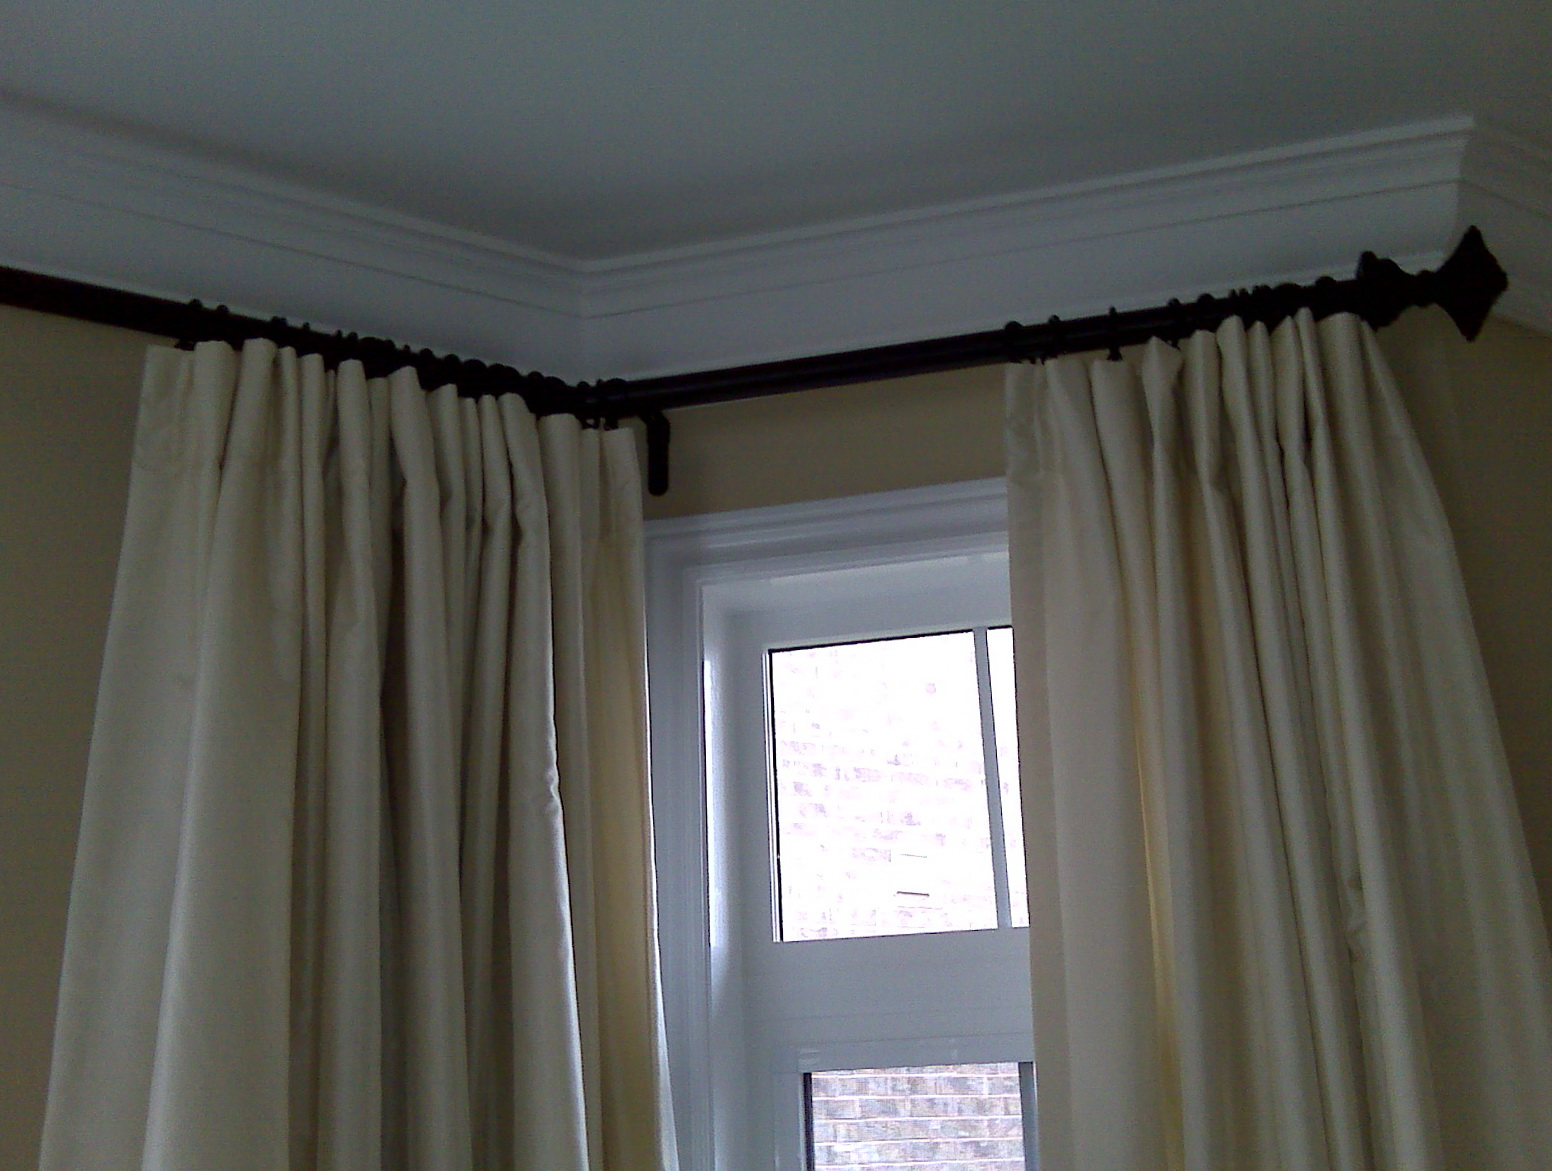 Drapery Installation Service : Curtain rod installation service home design ideas